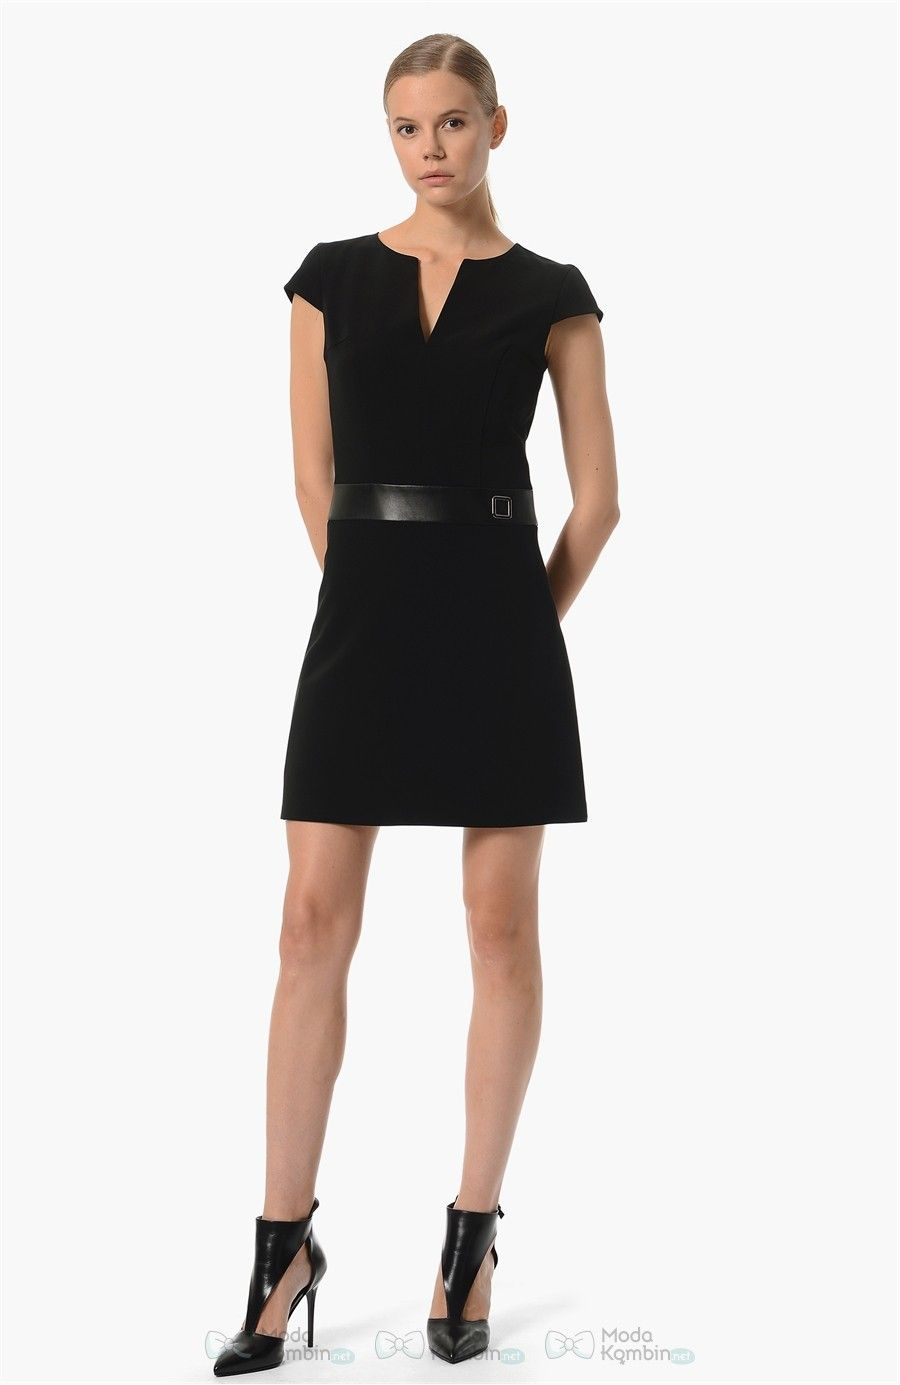 2017 Network Bayan Elbise Modelleri 2017networkbayanelbisemodasi 2017networkbayanelbisemodelleri Gunlukelbisemodell Moda Stilleri Elbise Modelleri Elbise